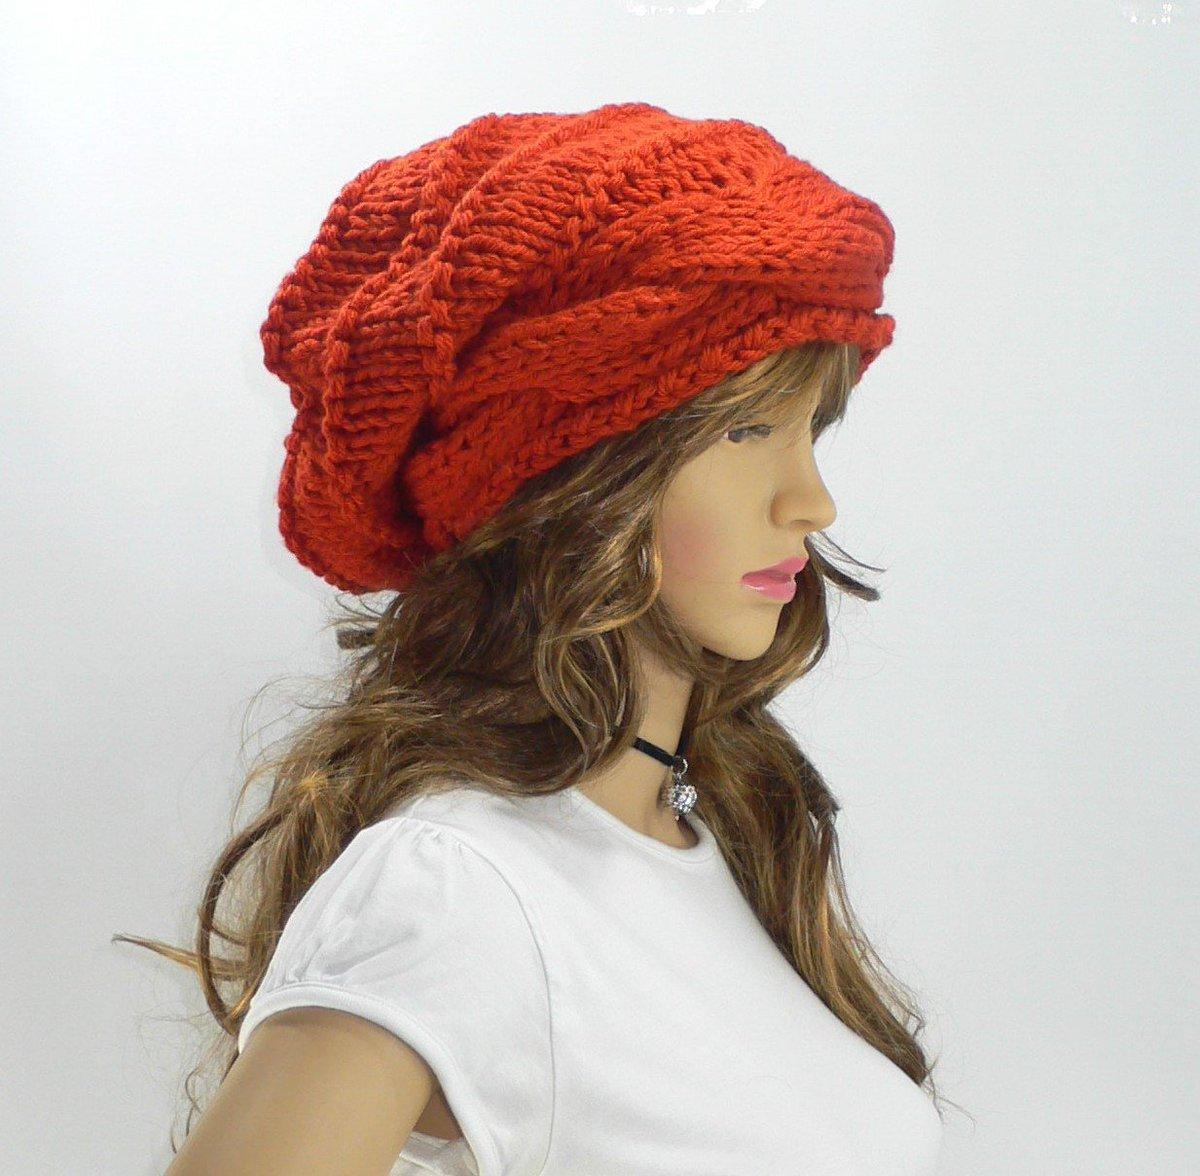 d20c7ad808e ... Women Orange Knit Hat Goth Hat Pixie Hat Slouchy Knit Hat Slouch Beanie  Hand Knit Hat Knit Beanie Woodland Clothing https   etsy.me 2GdtWXa   accessories ...